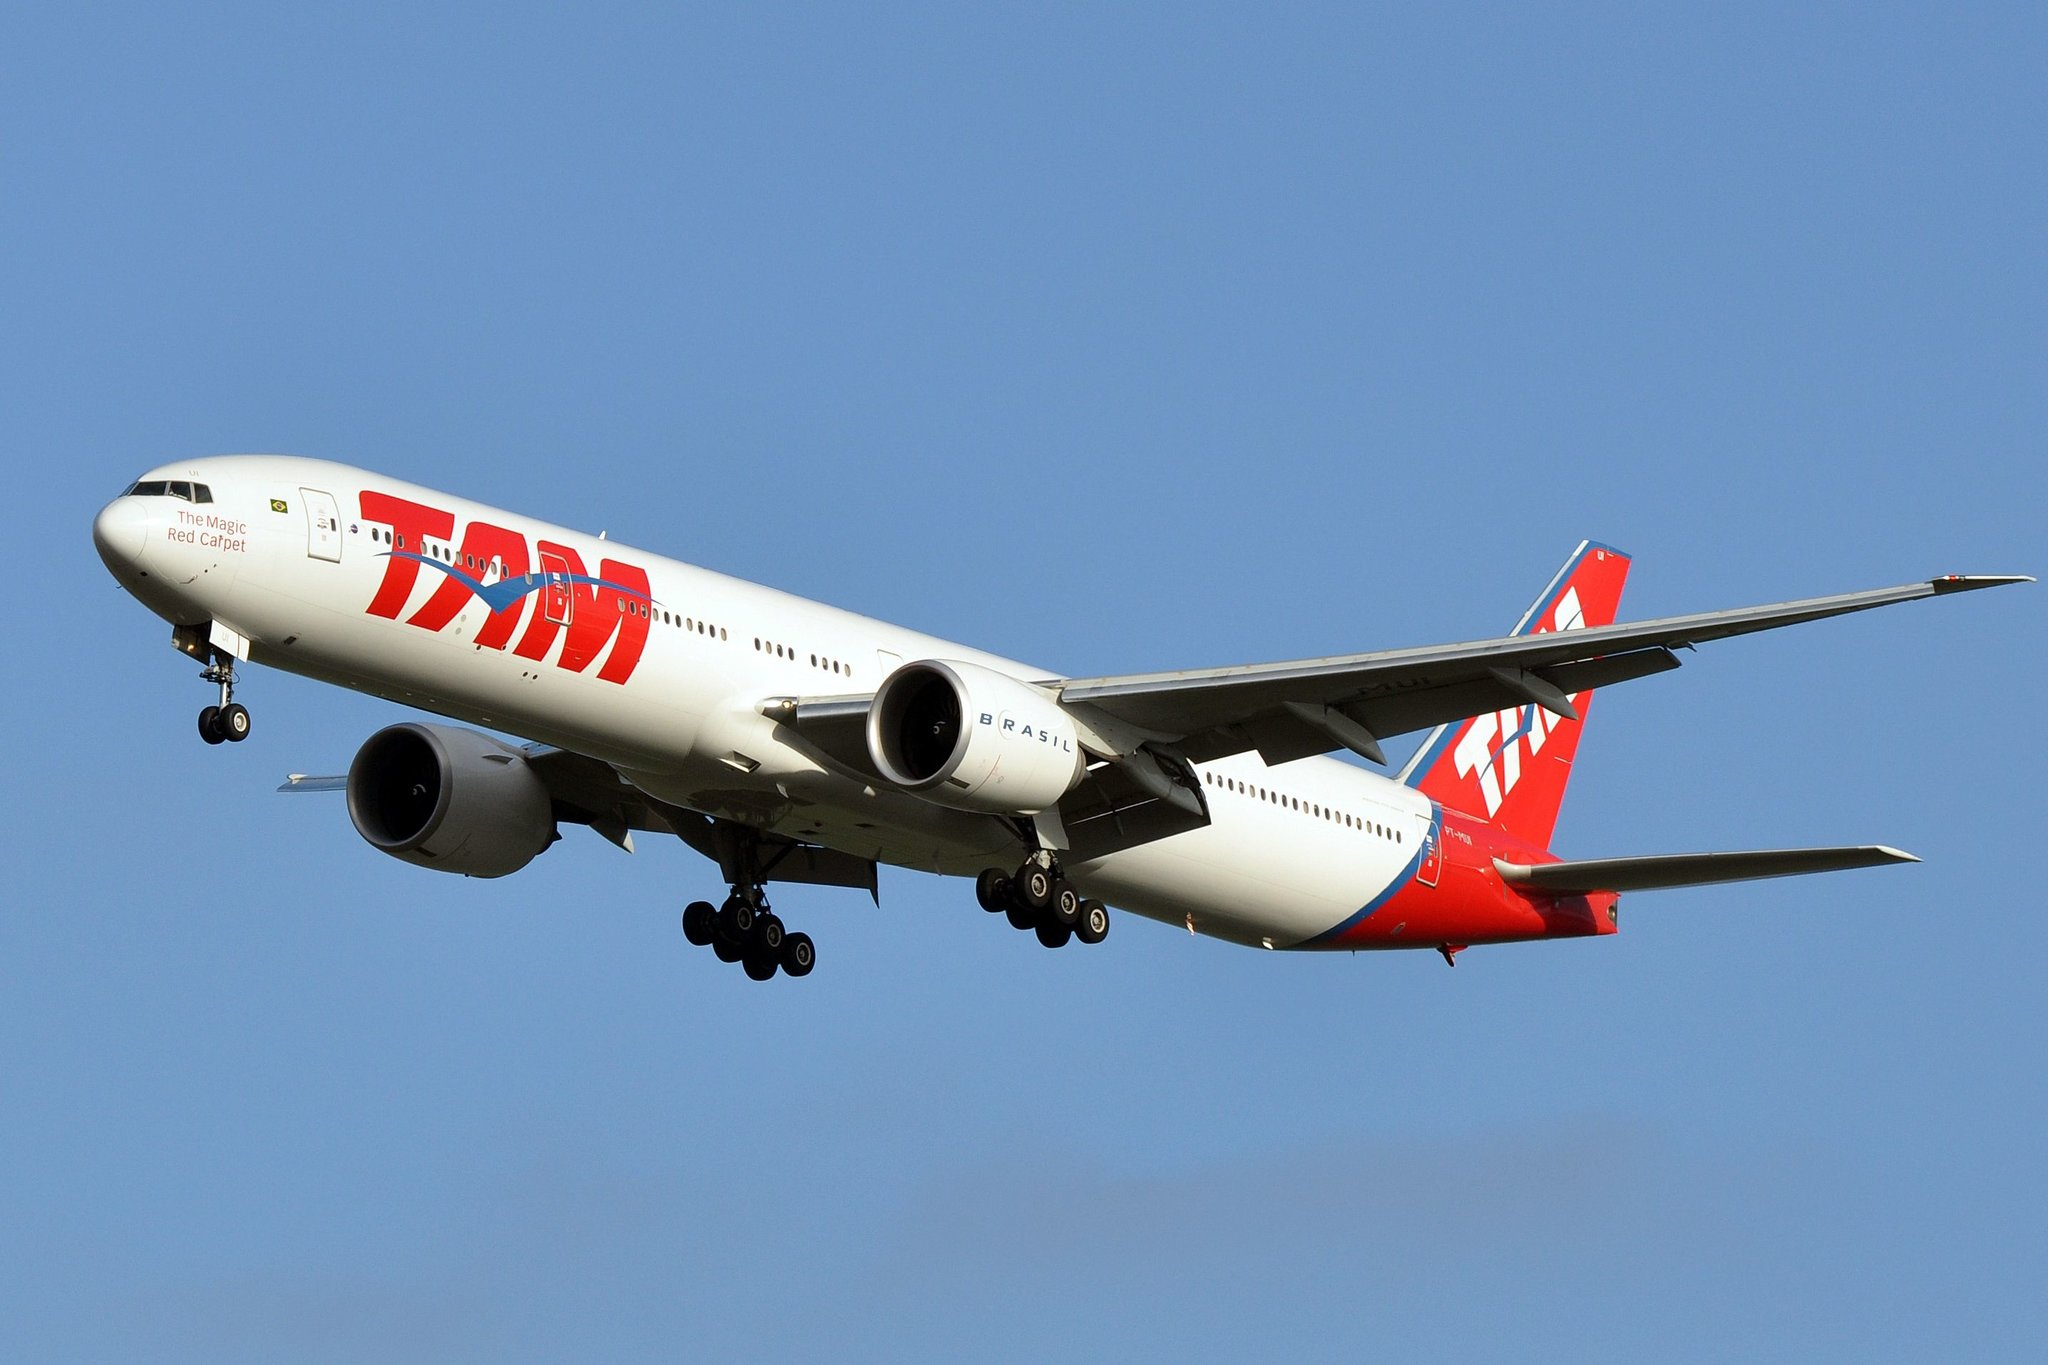 В пути, автор: airlines470, лицензия: CC BY SA 2.0